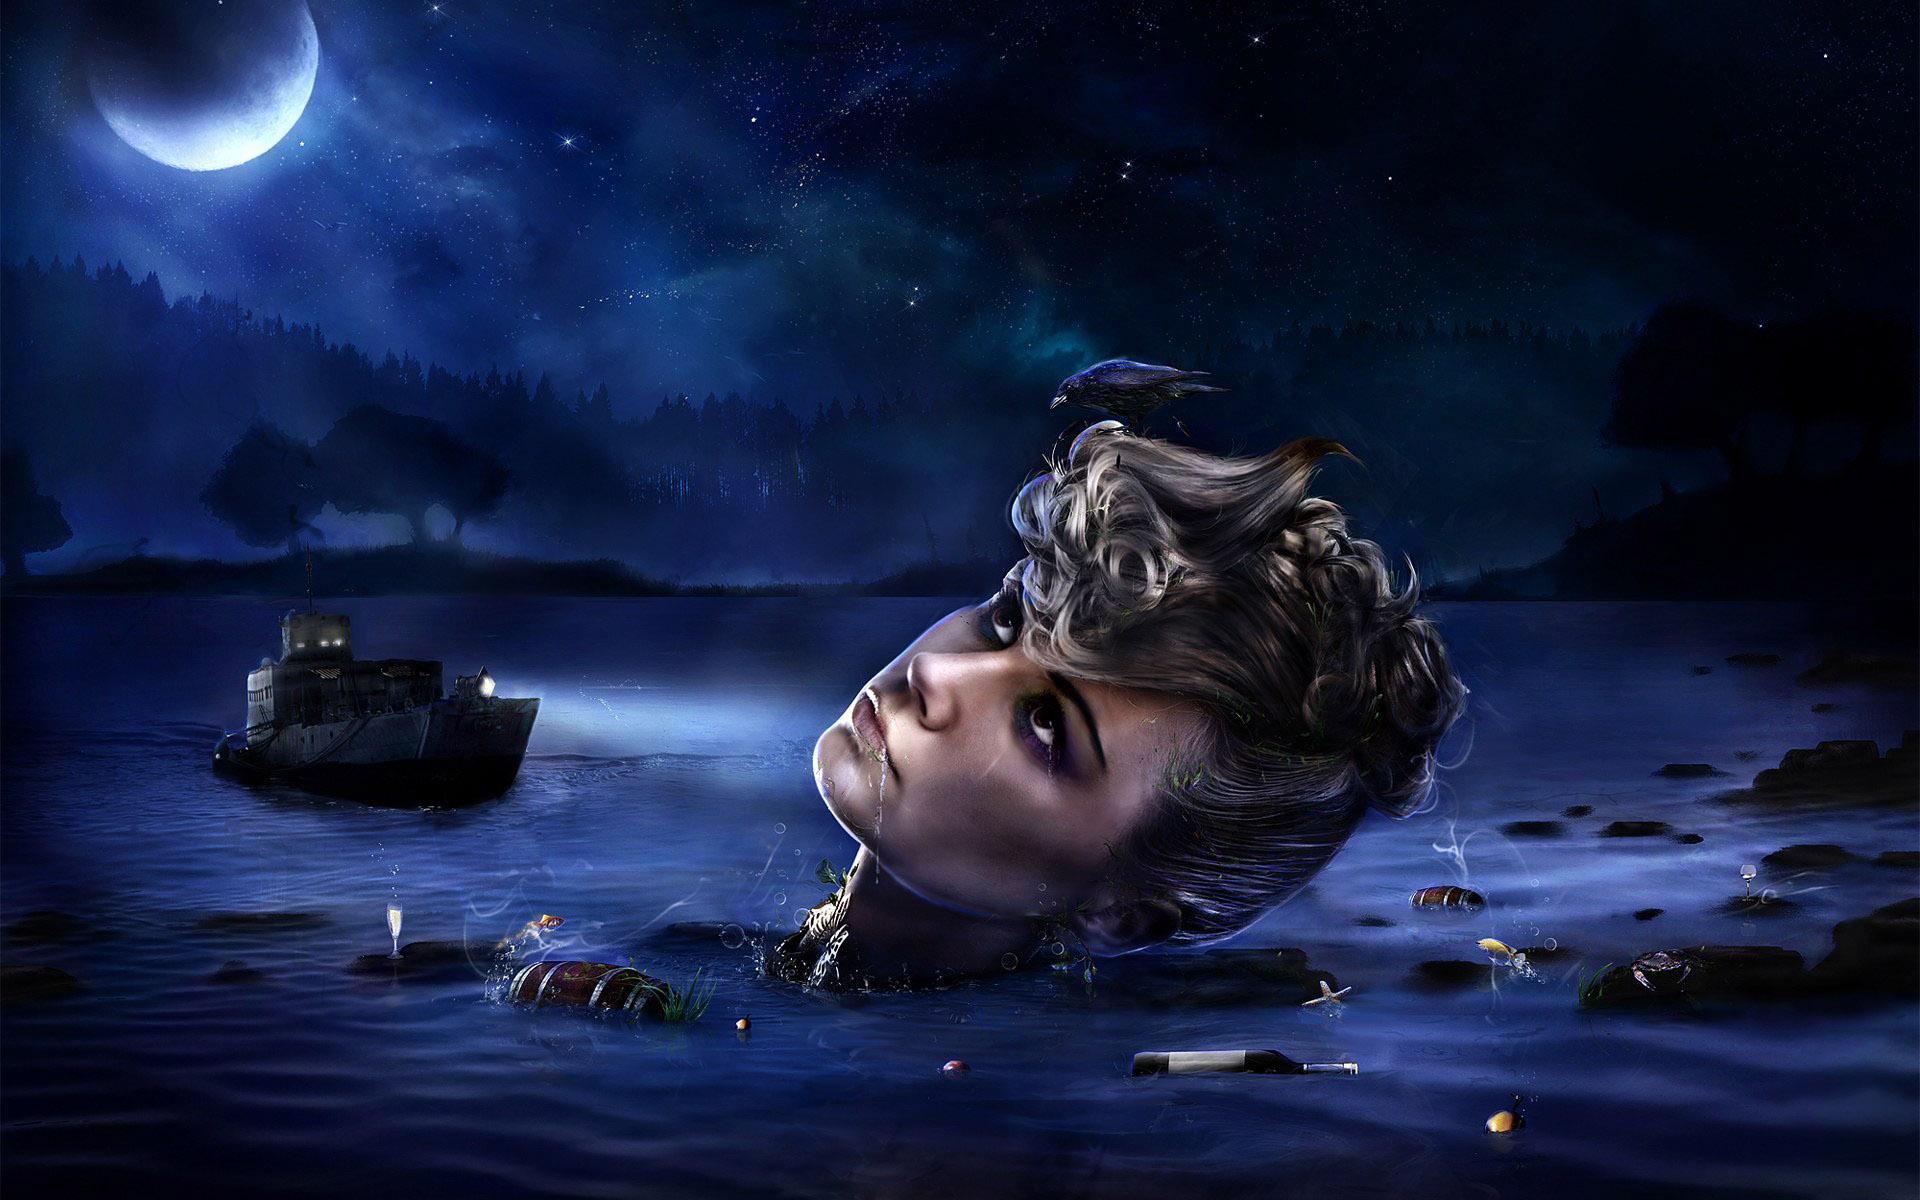 Картинки фантастической ночи